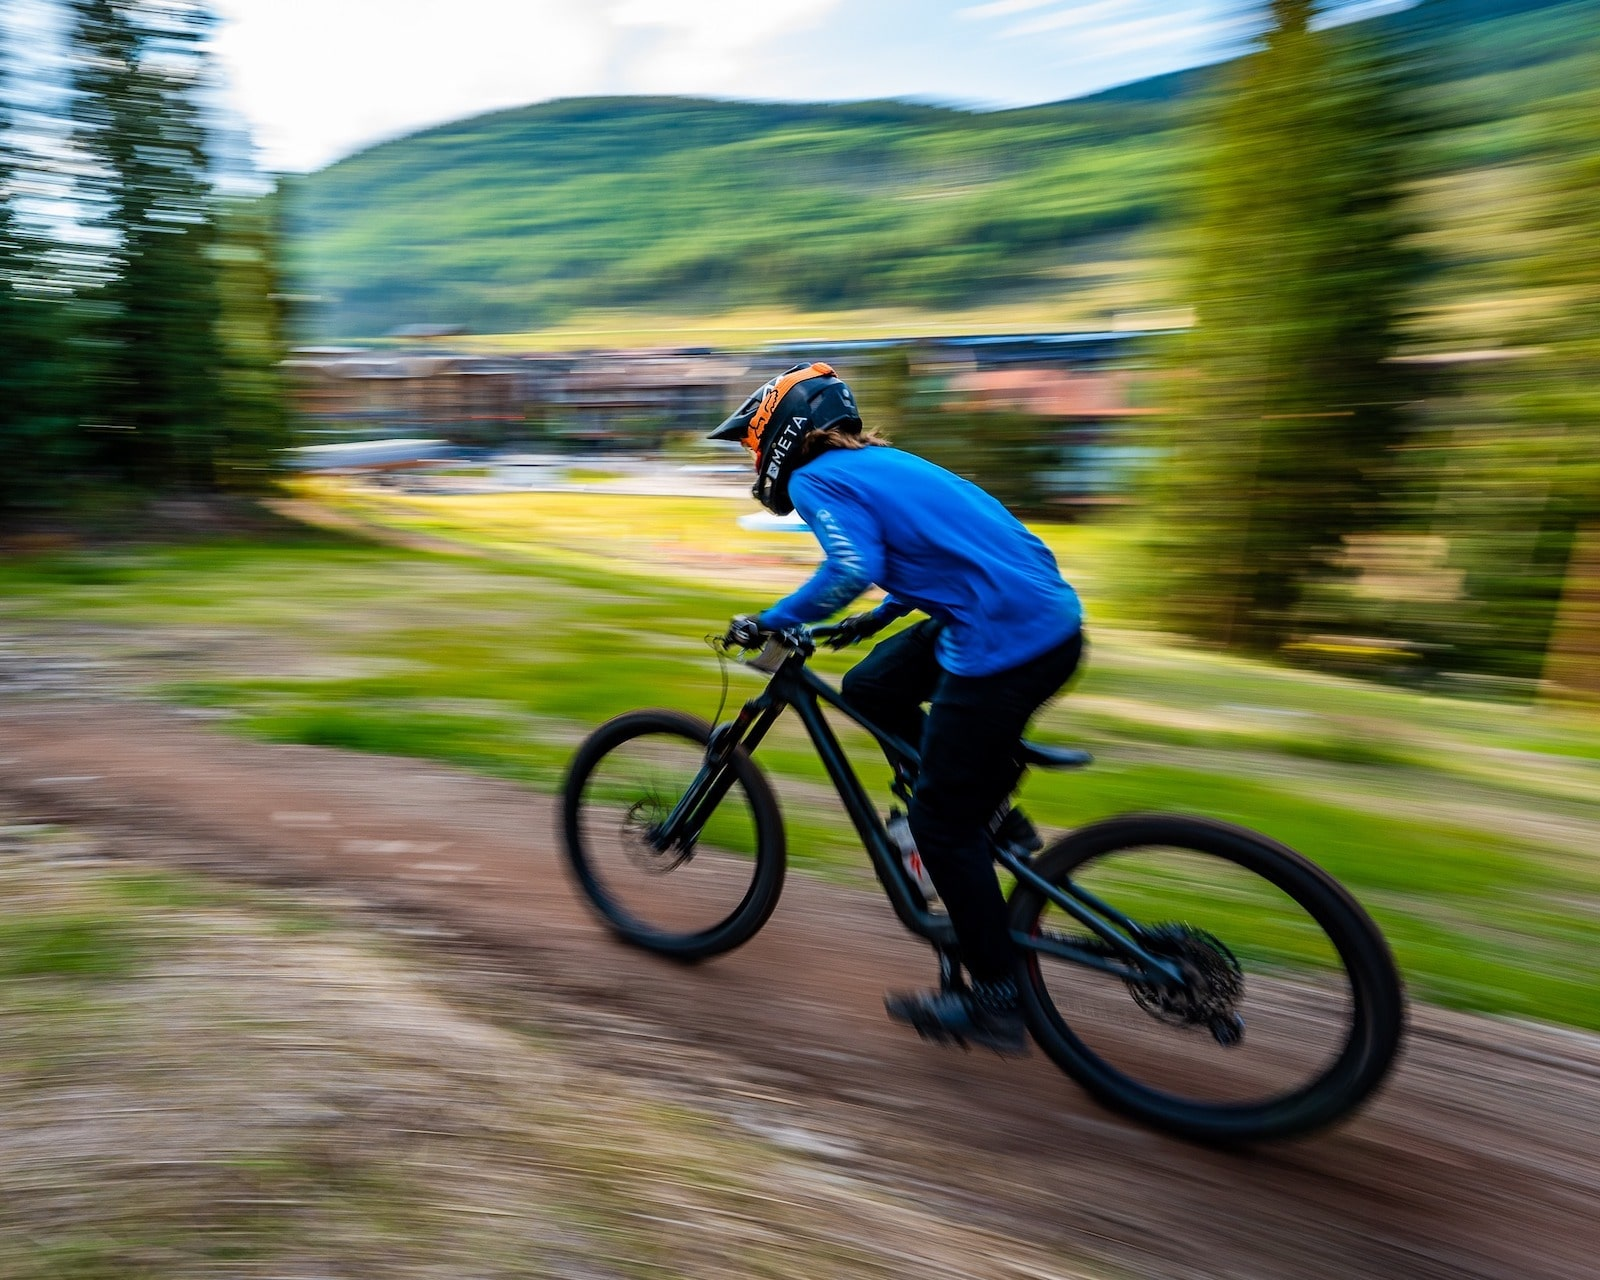 Image of a person mountain biking at Copper Mountain in Colorado